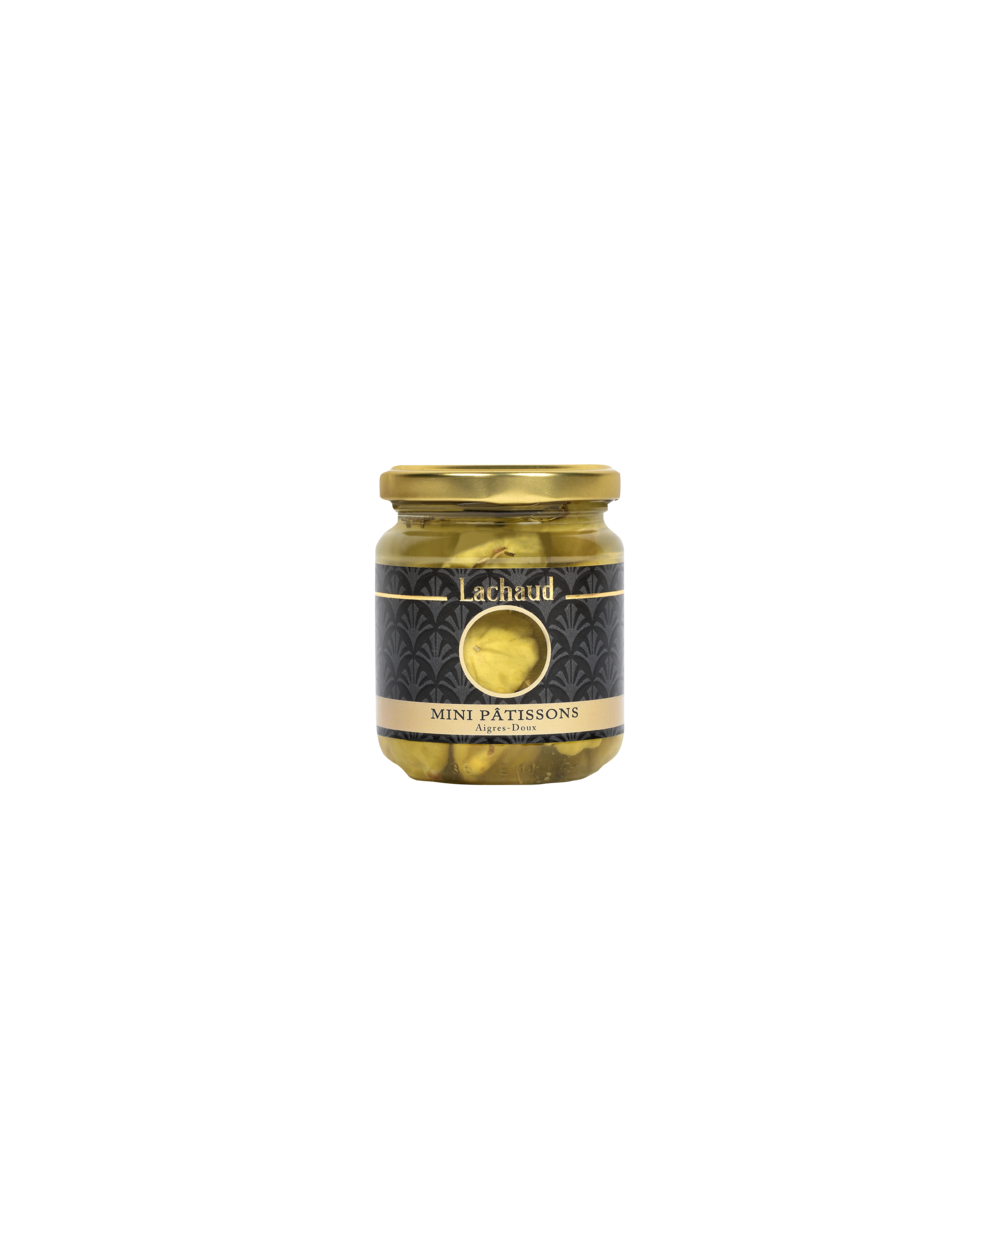 Mini Pâtissons Aigres-Doux 110g